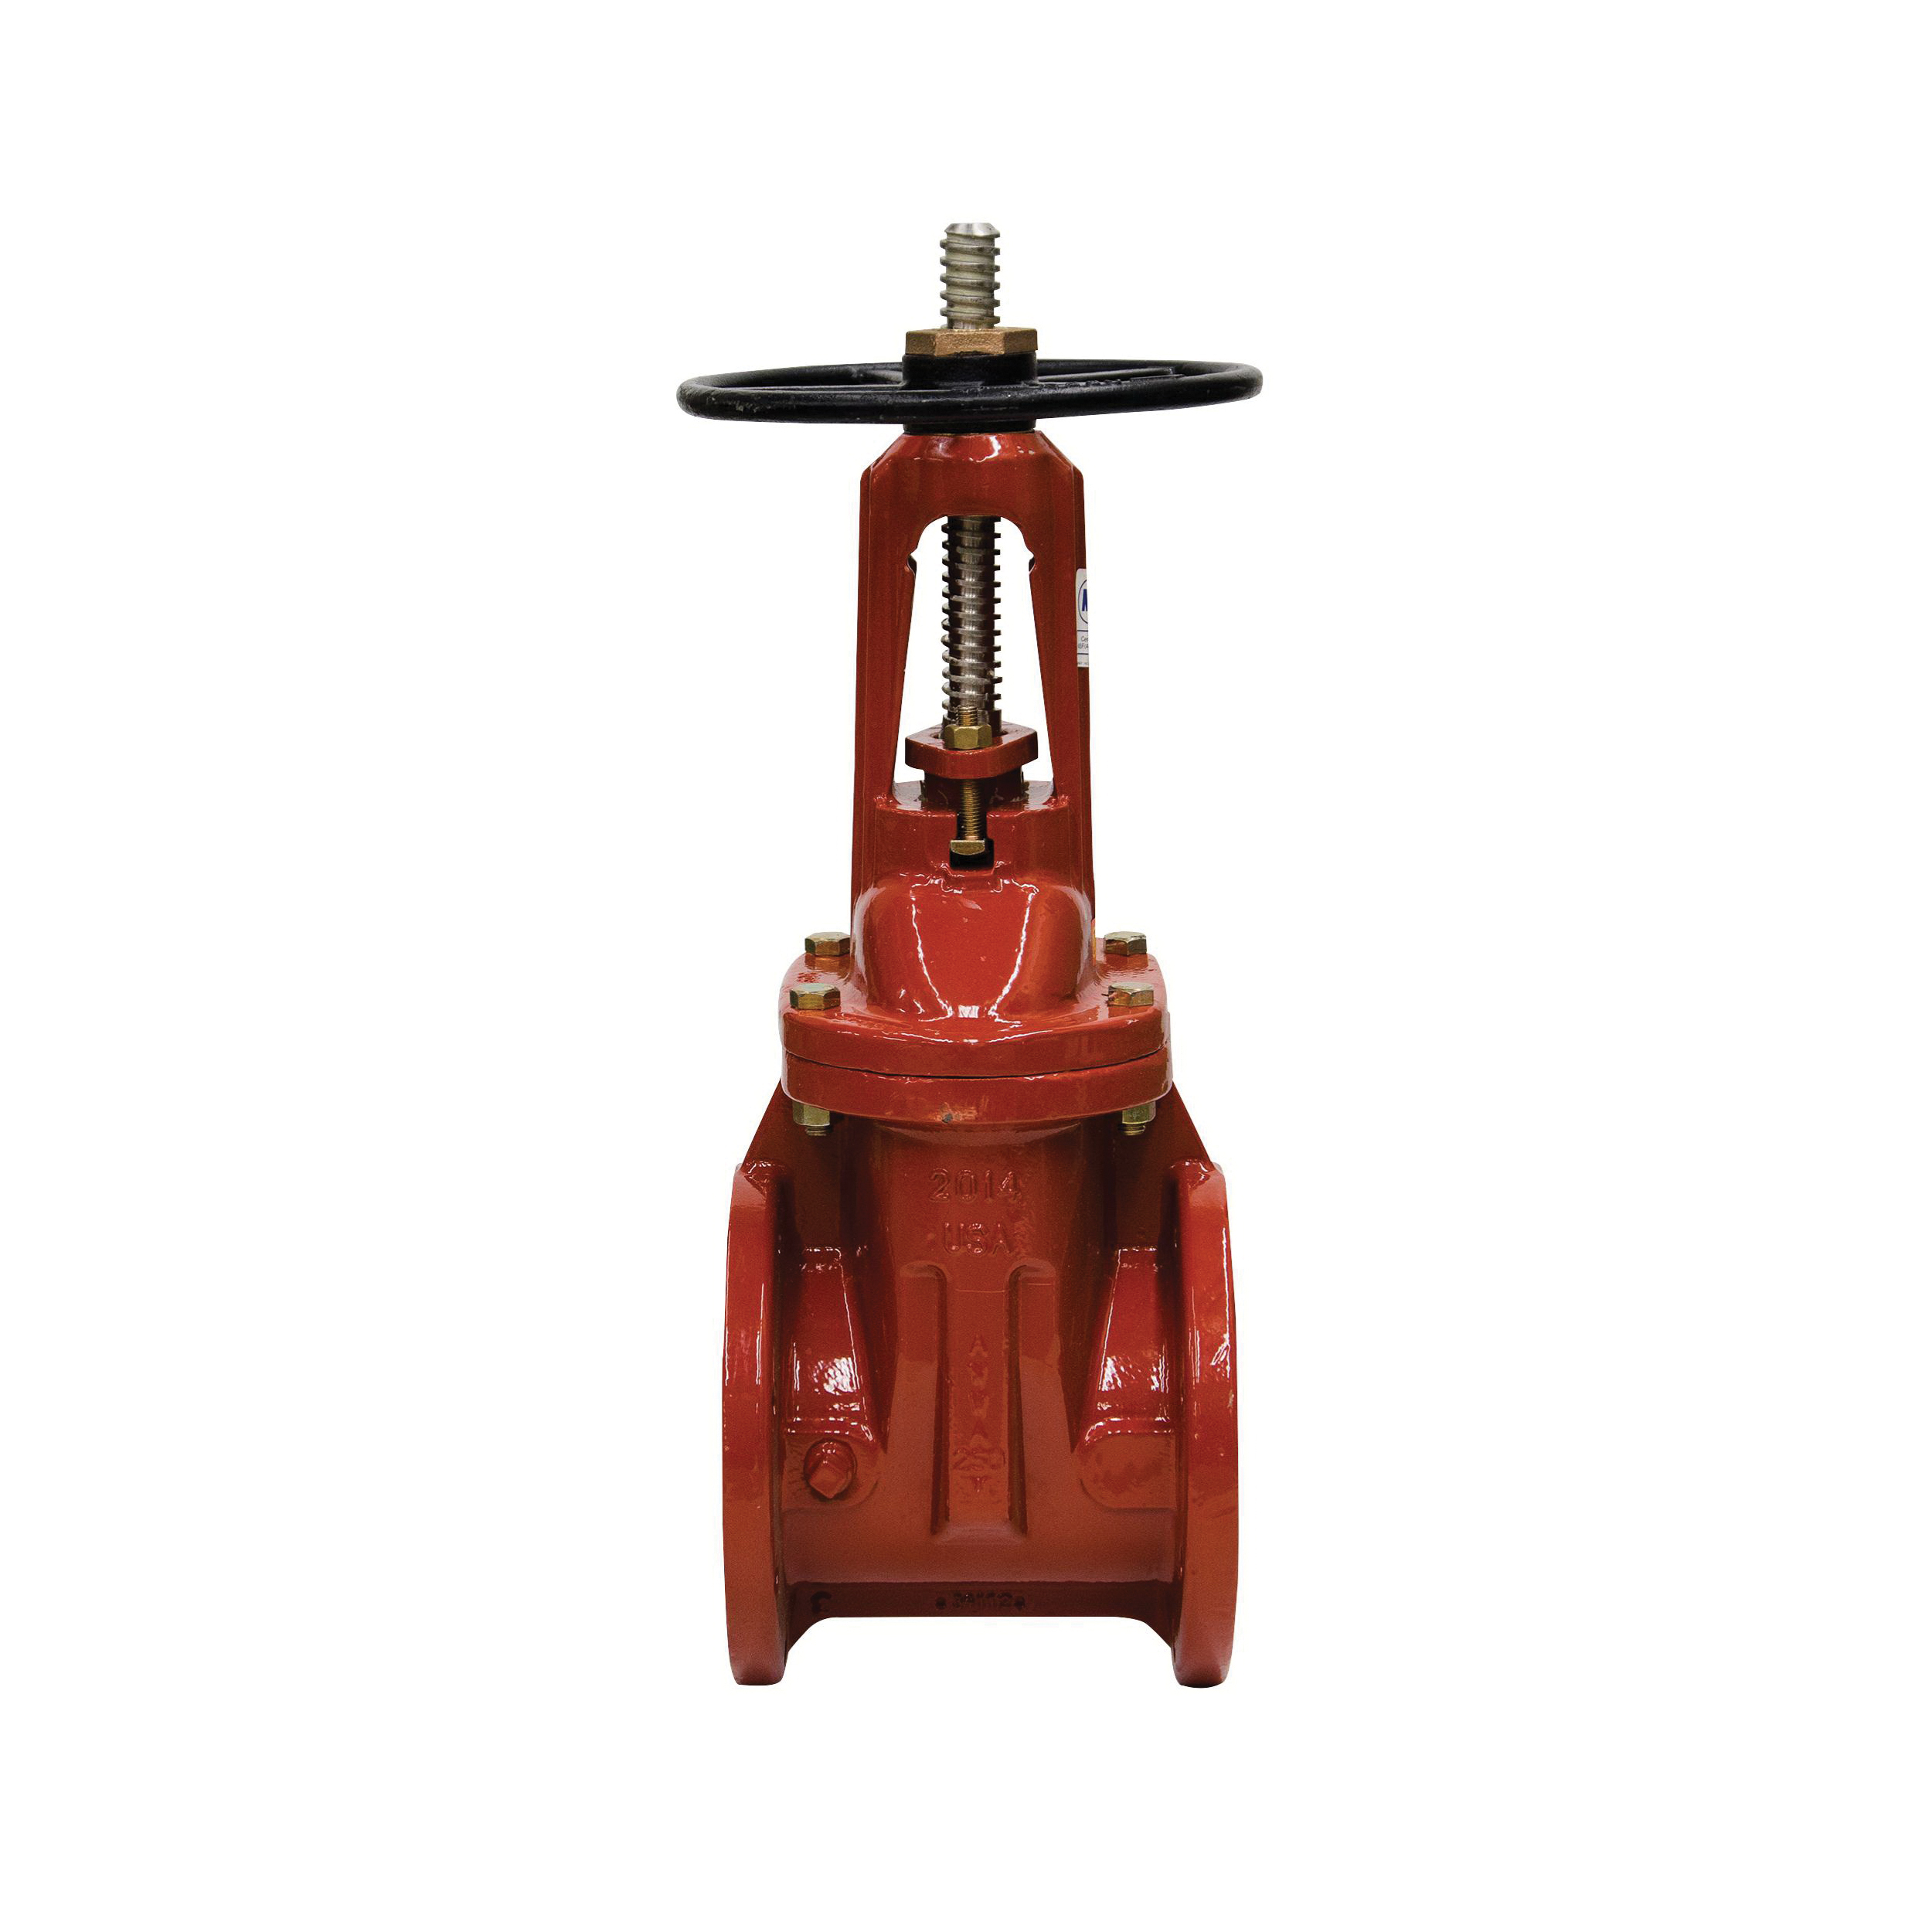 WATTS® 408-OSYRW Lead Free Gate Valve, 6 in, Flanged, Cast Iron, Handwheel Actuator